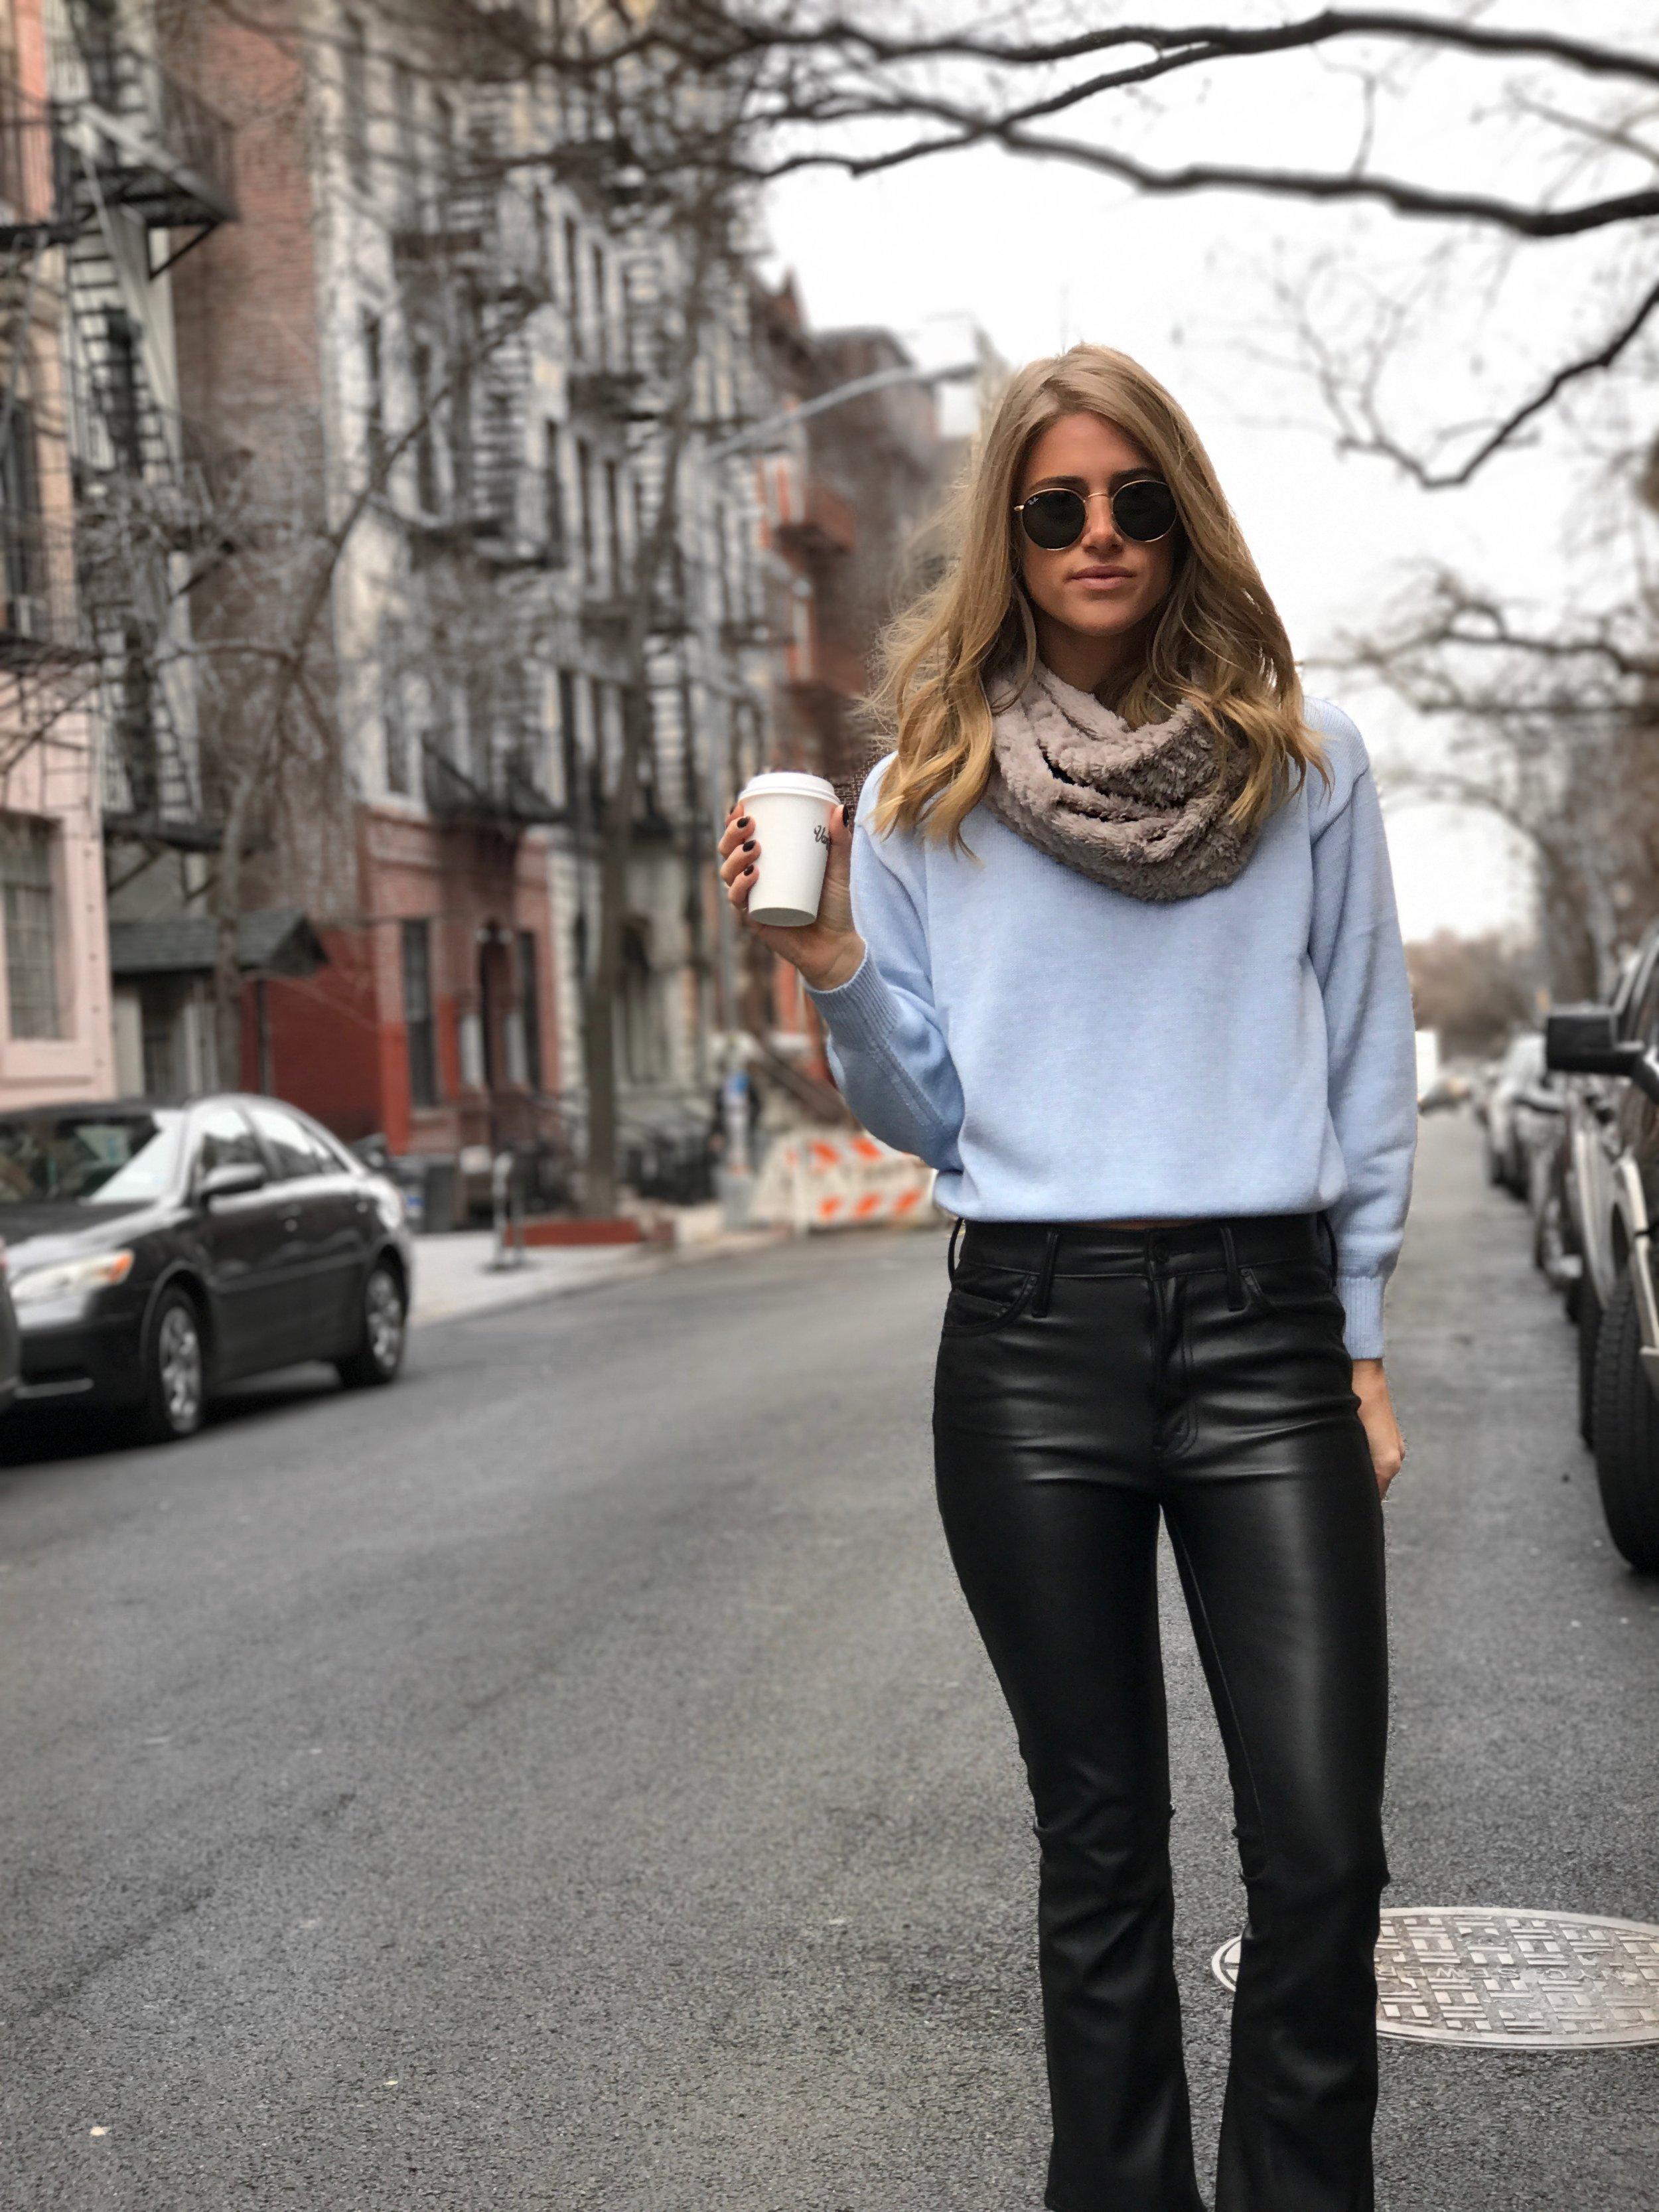 H&M Sweater, $24.99